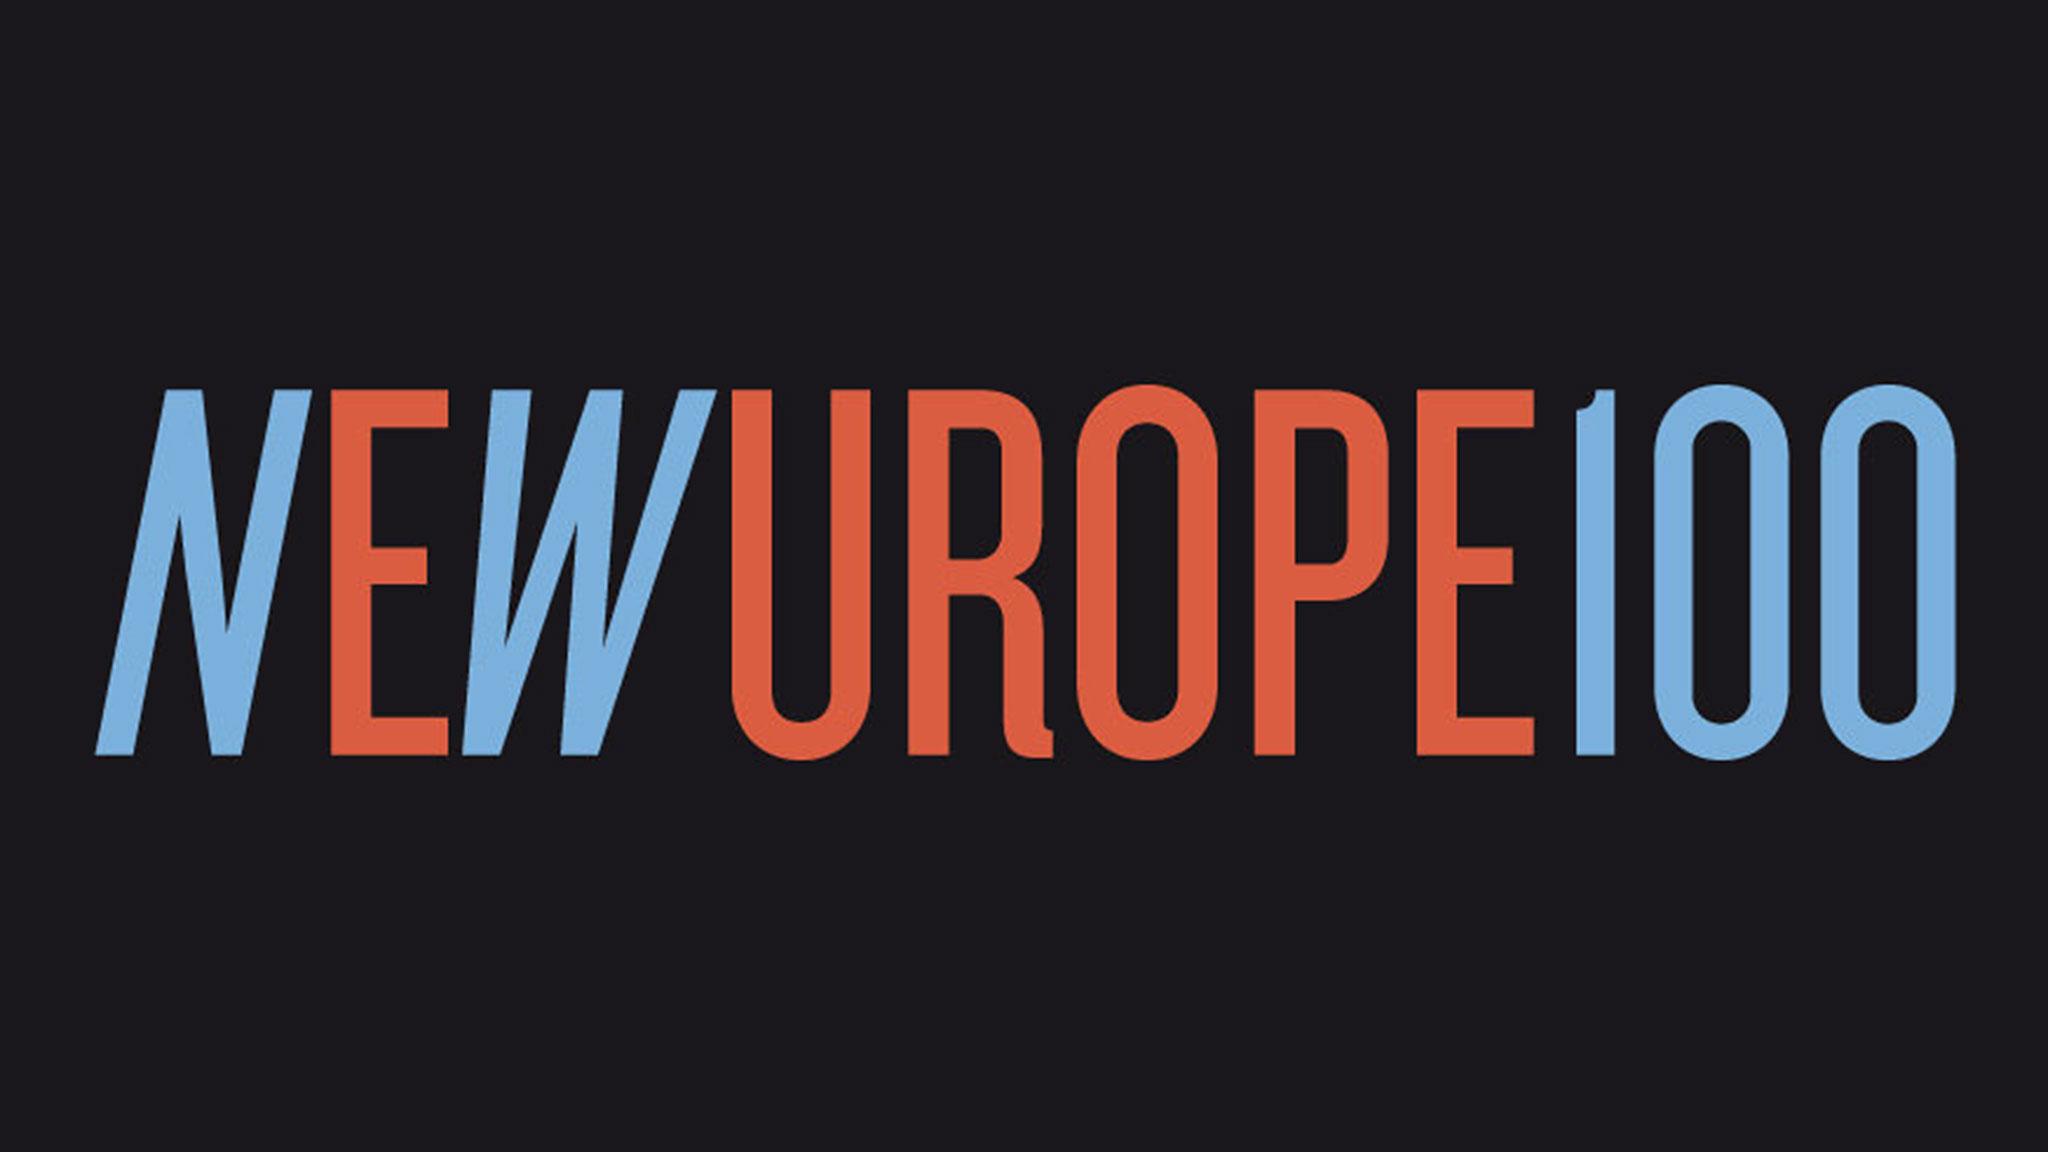 ft.com - New Europe 100: eastern Europe's emerging technology stars